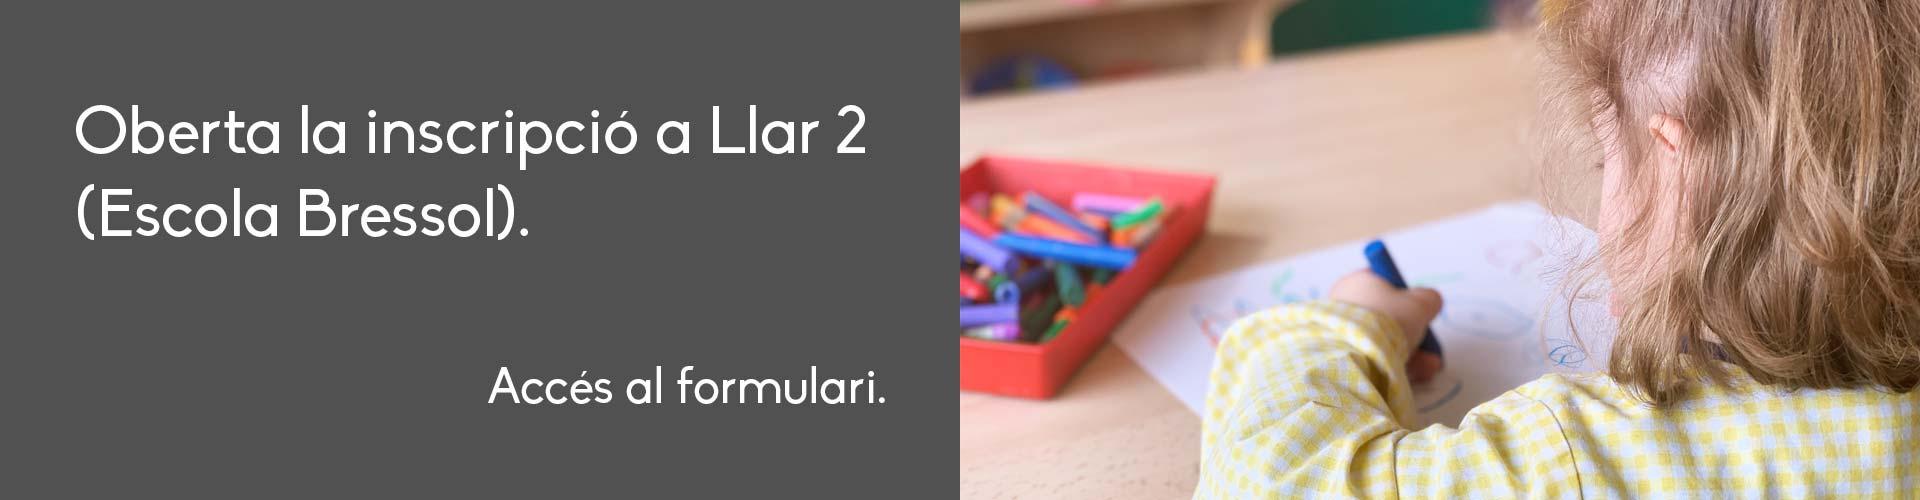 banner-matriculacio-llar2-regina-carmeli-horta